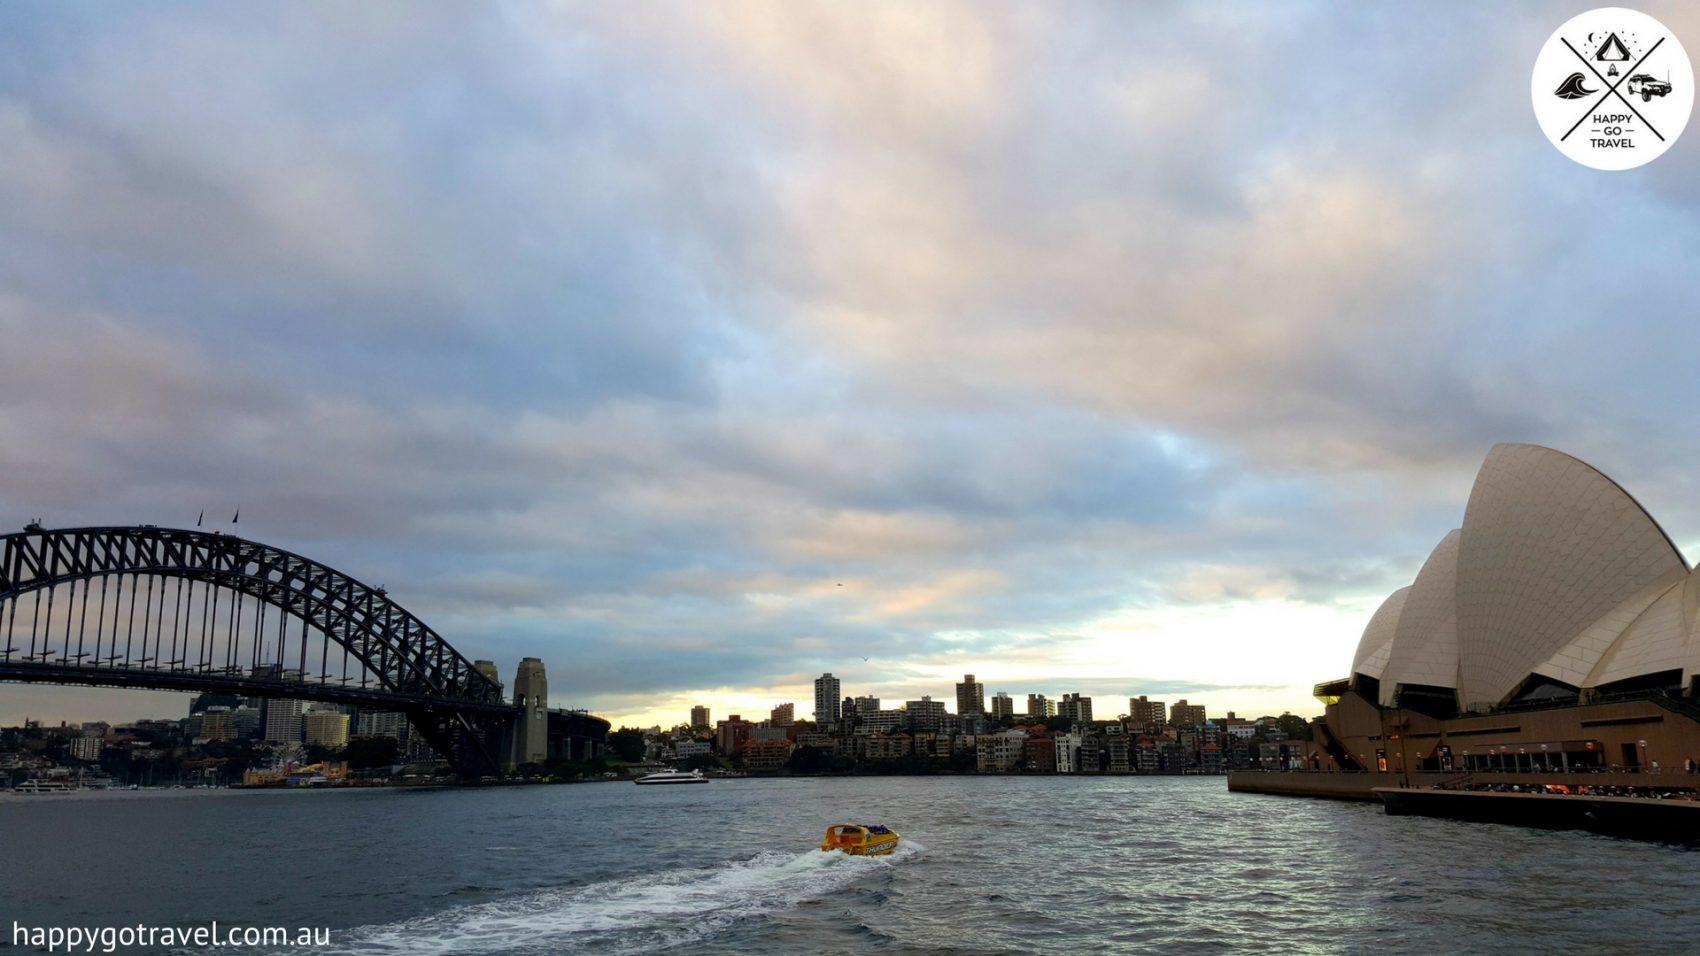 Sydney harbour with both the Sydney harbour bridge and sydney opera house